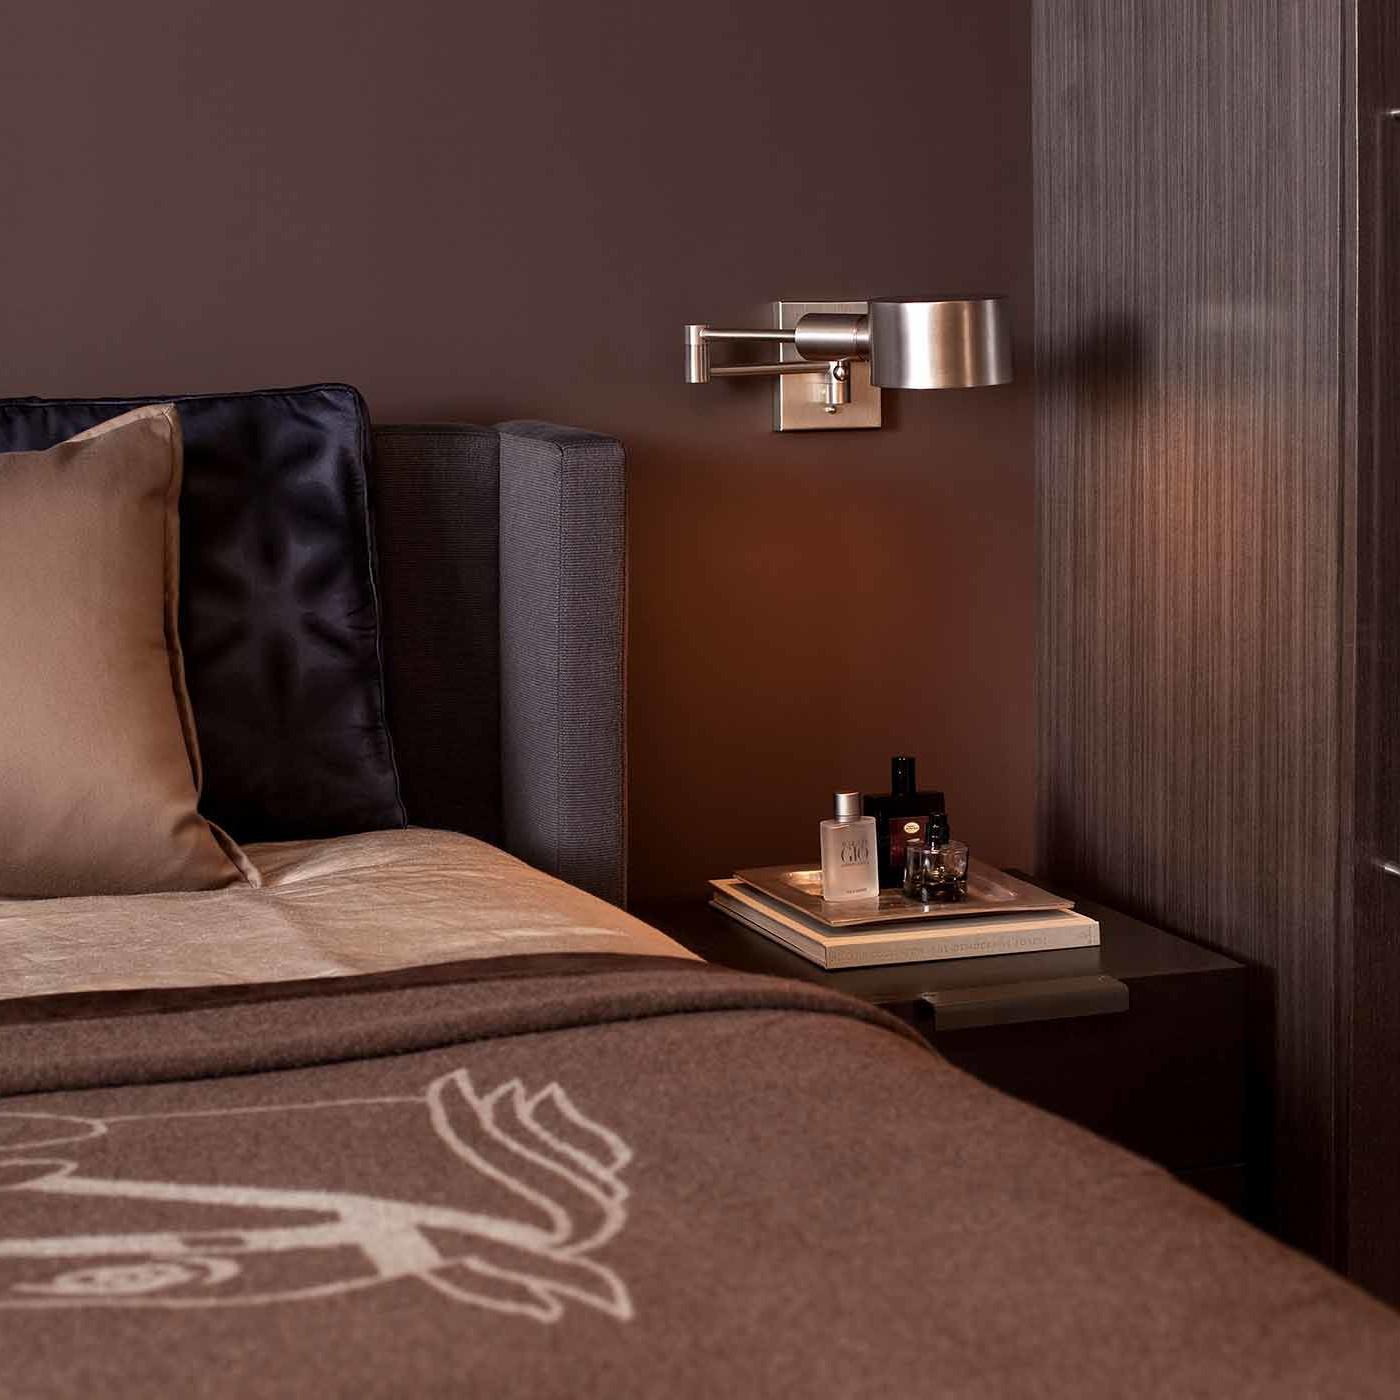 Bedroom interior design by NYC's top interior design firm Darci Hether New York